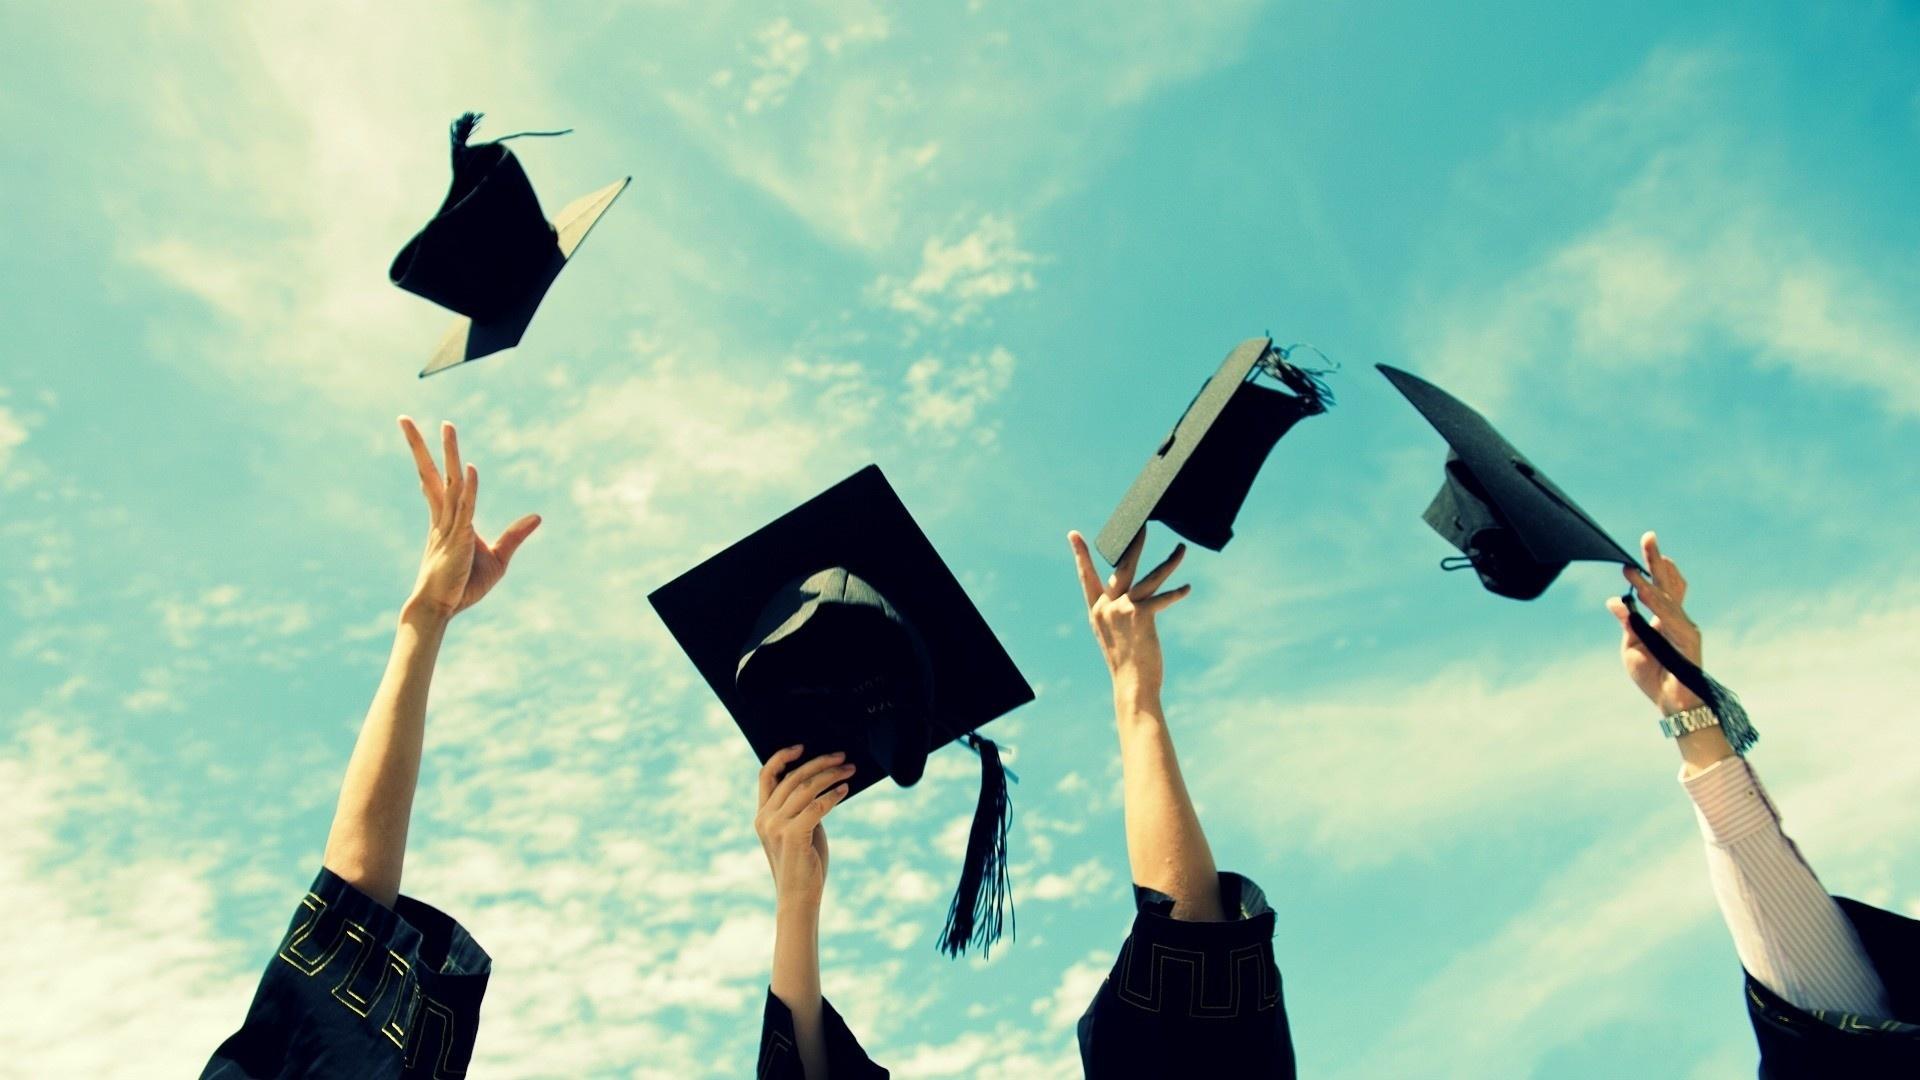 Graduation Wallpaper theme